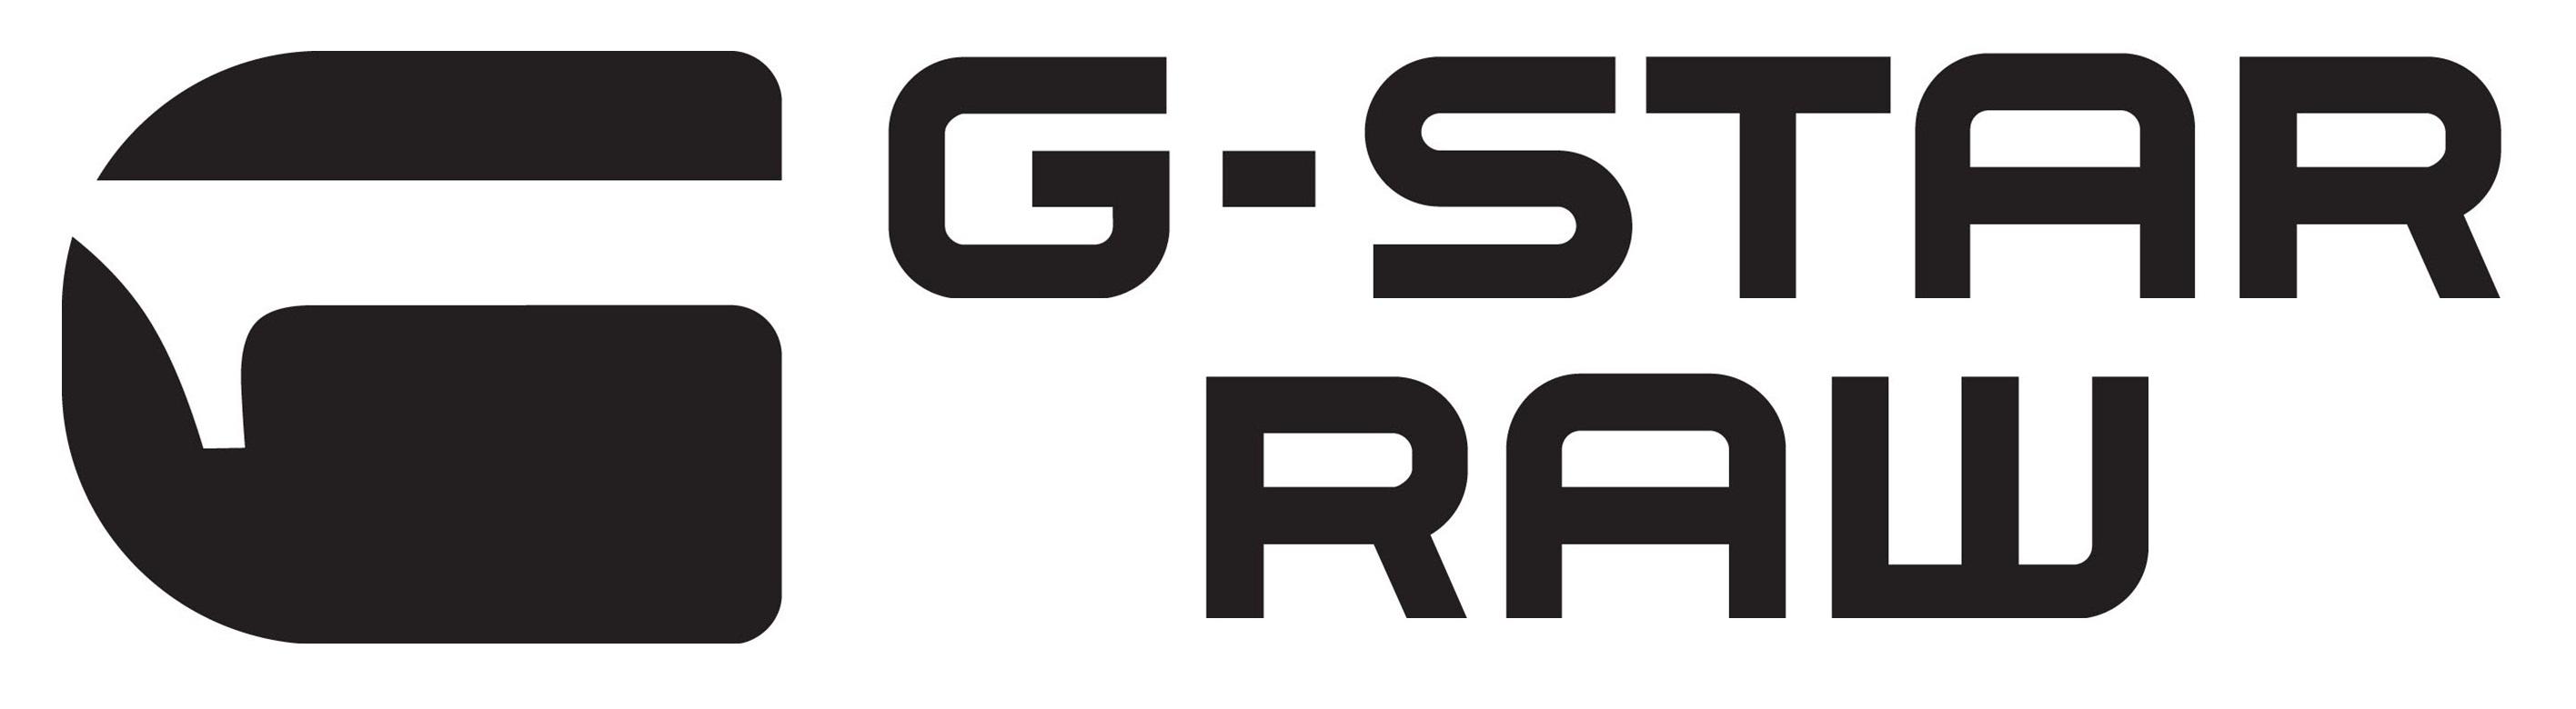 Kortingscode G-Star voor 15% korting